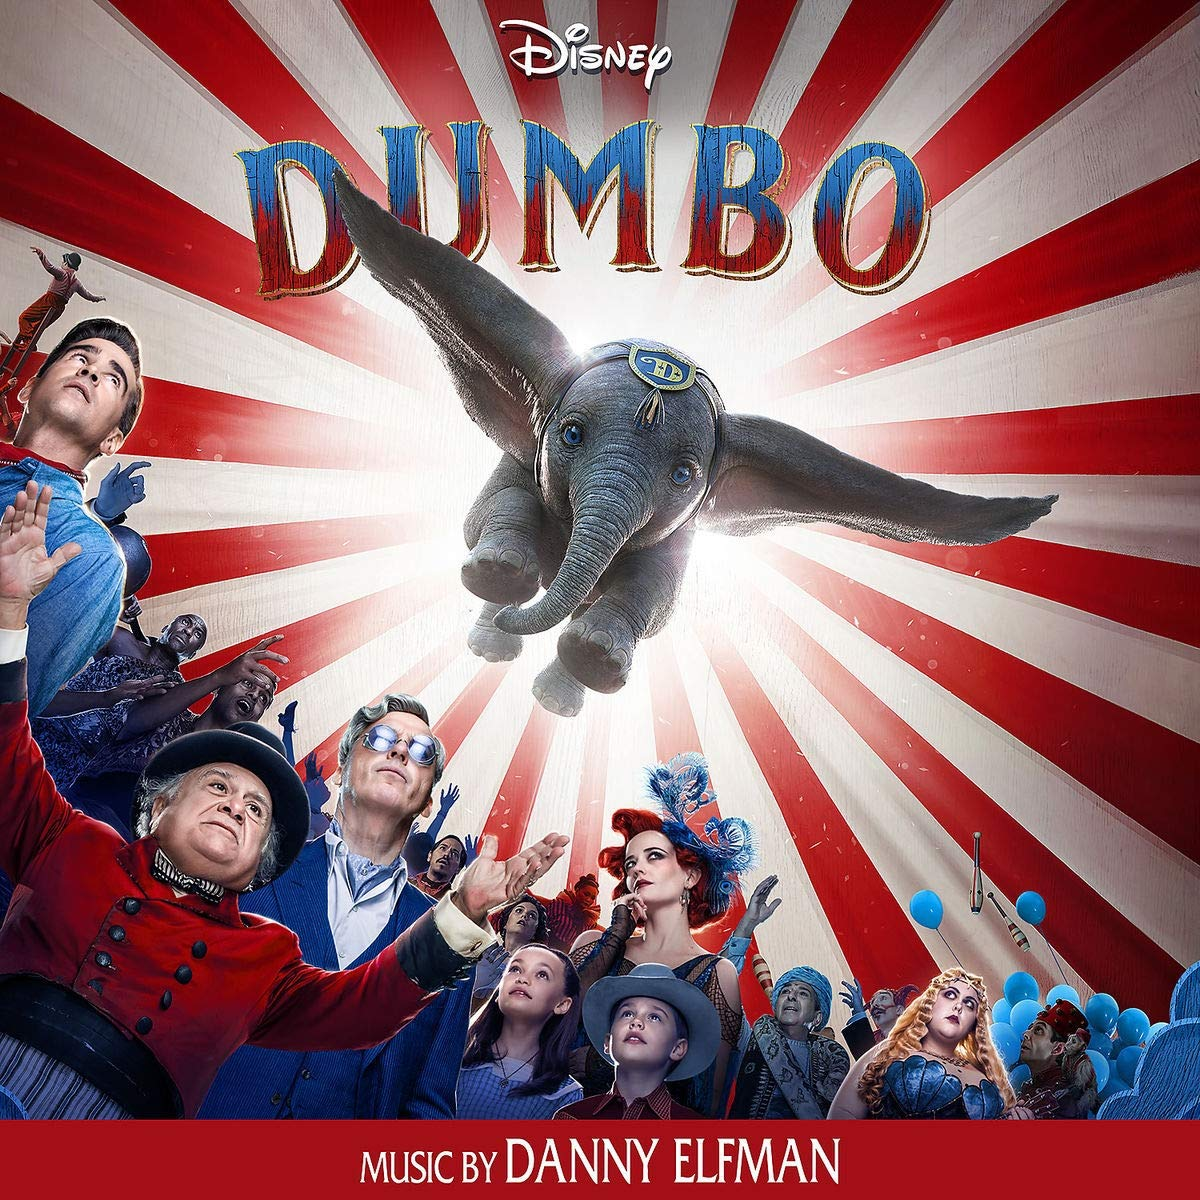 Dumbo Soundtrack Out Now Diskingdom Com Disney